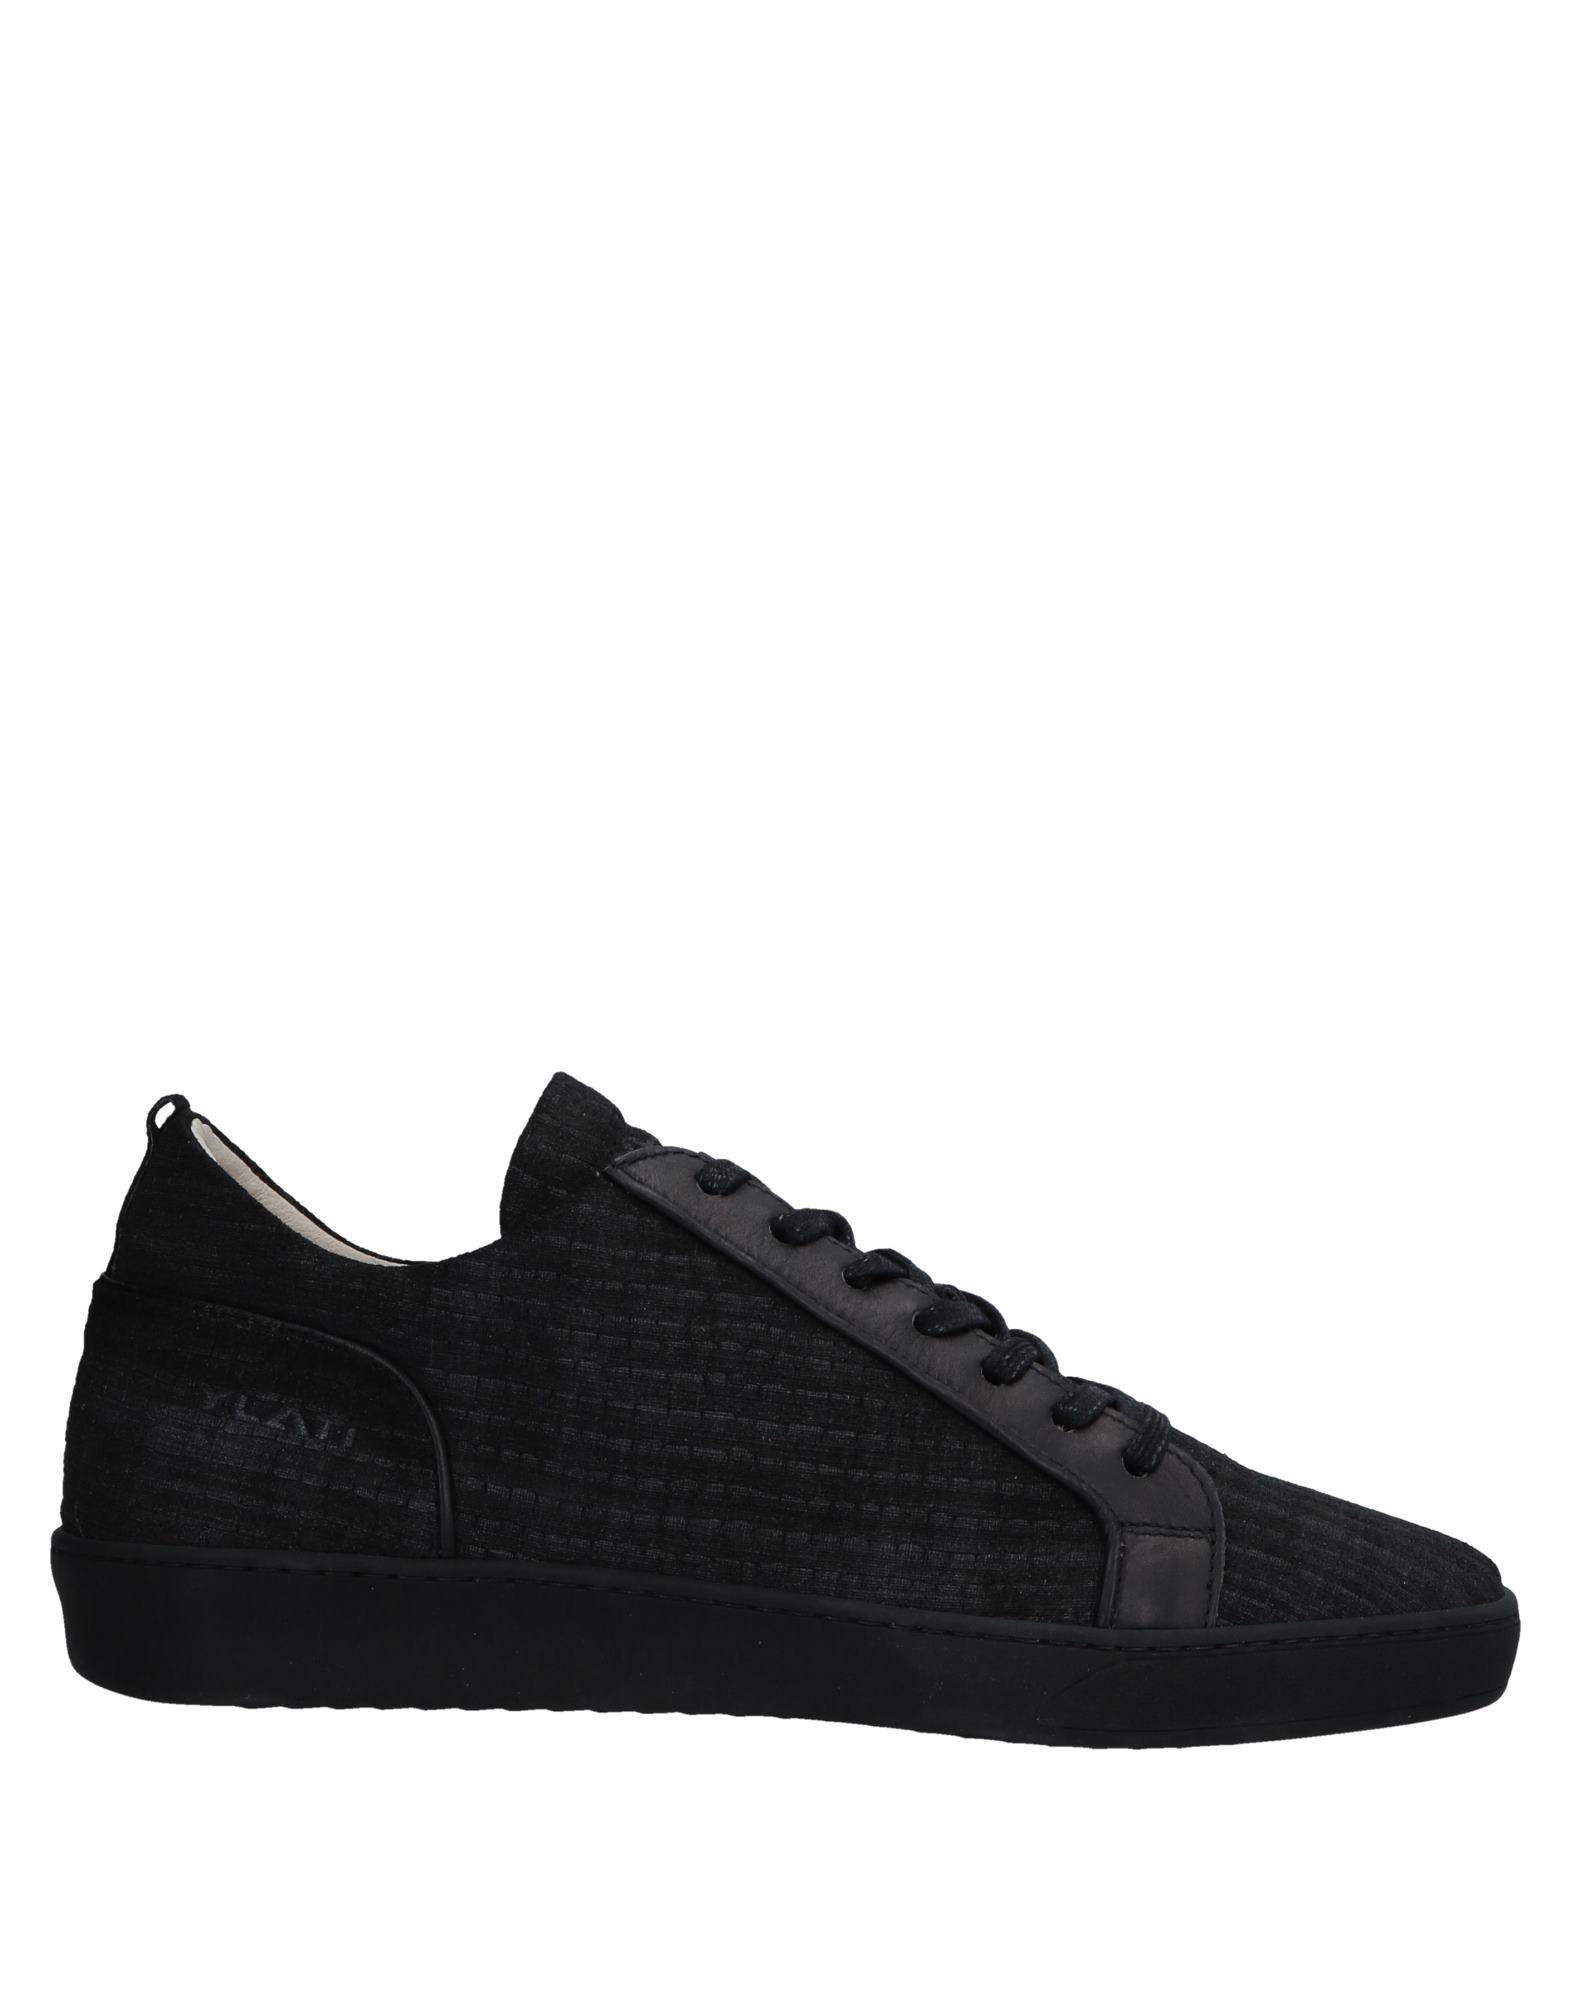 Ylati Sneakers - Men Men Men Ylati Sneakers online on  Australia - 11579305EC 15d41c